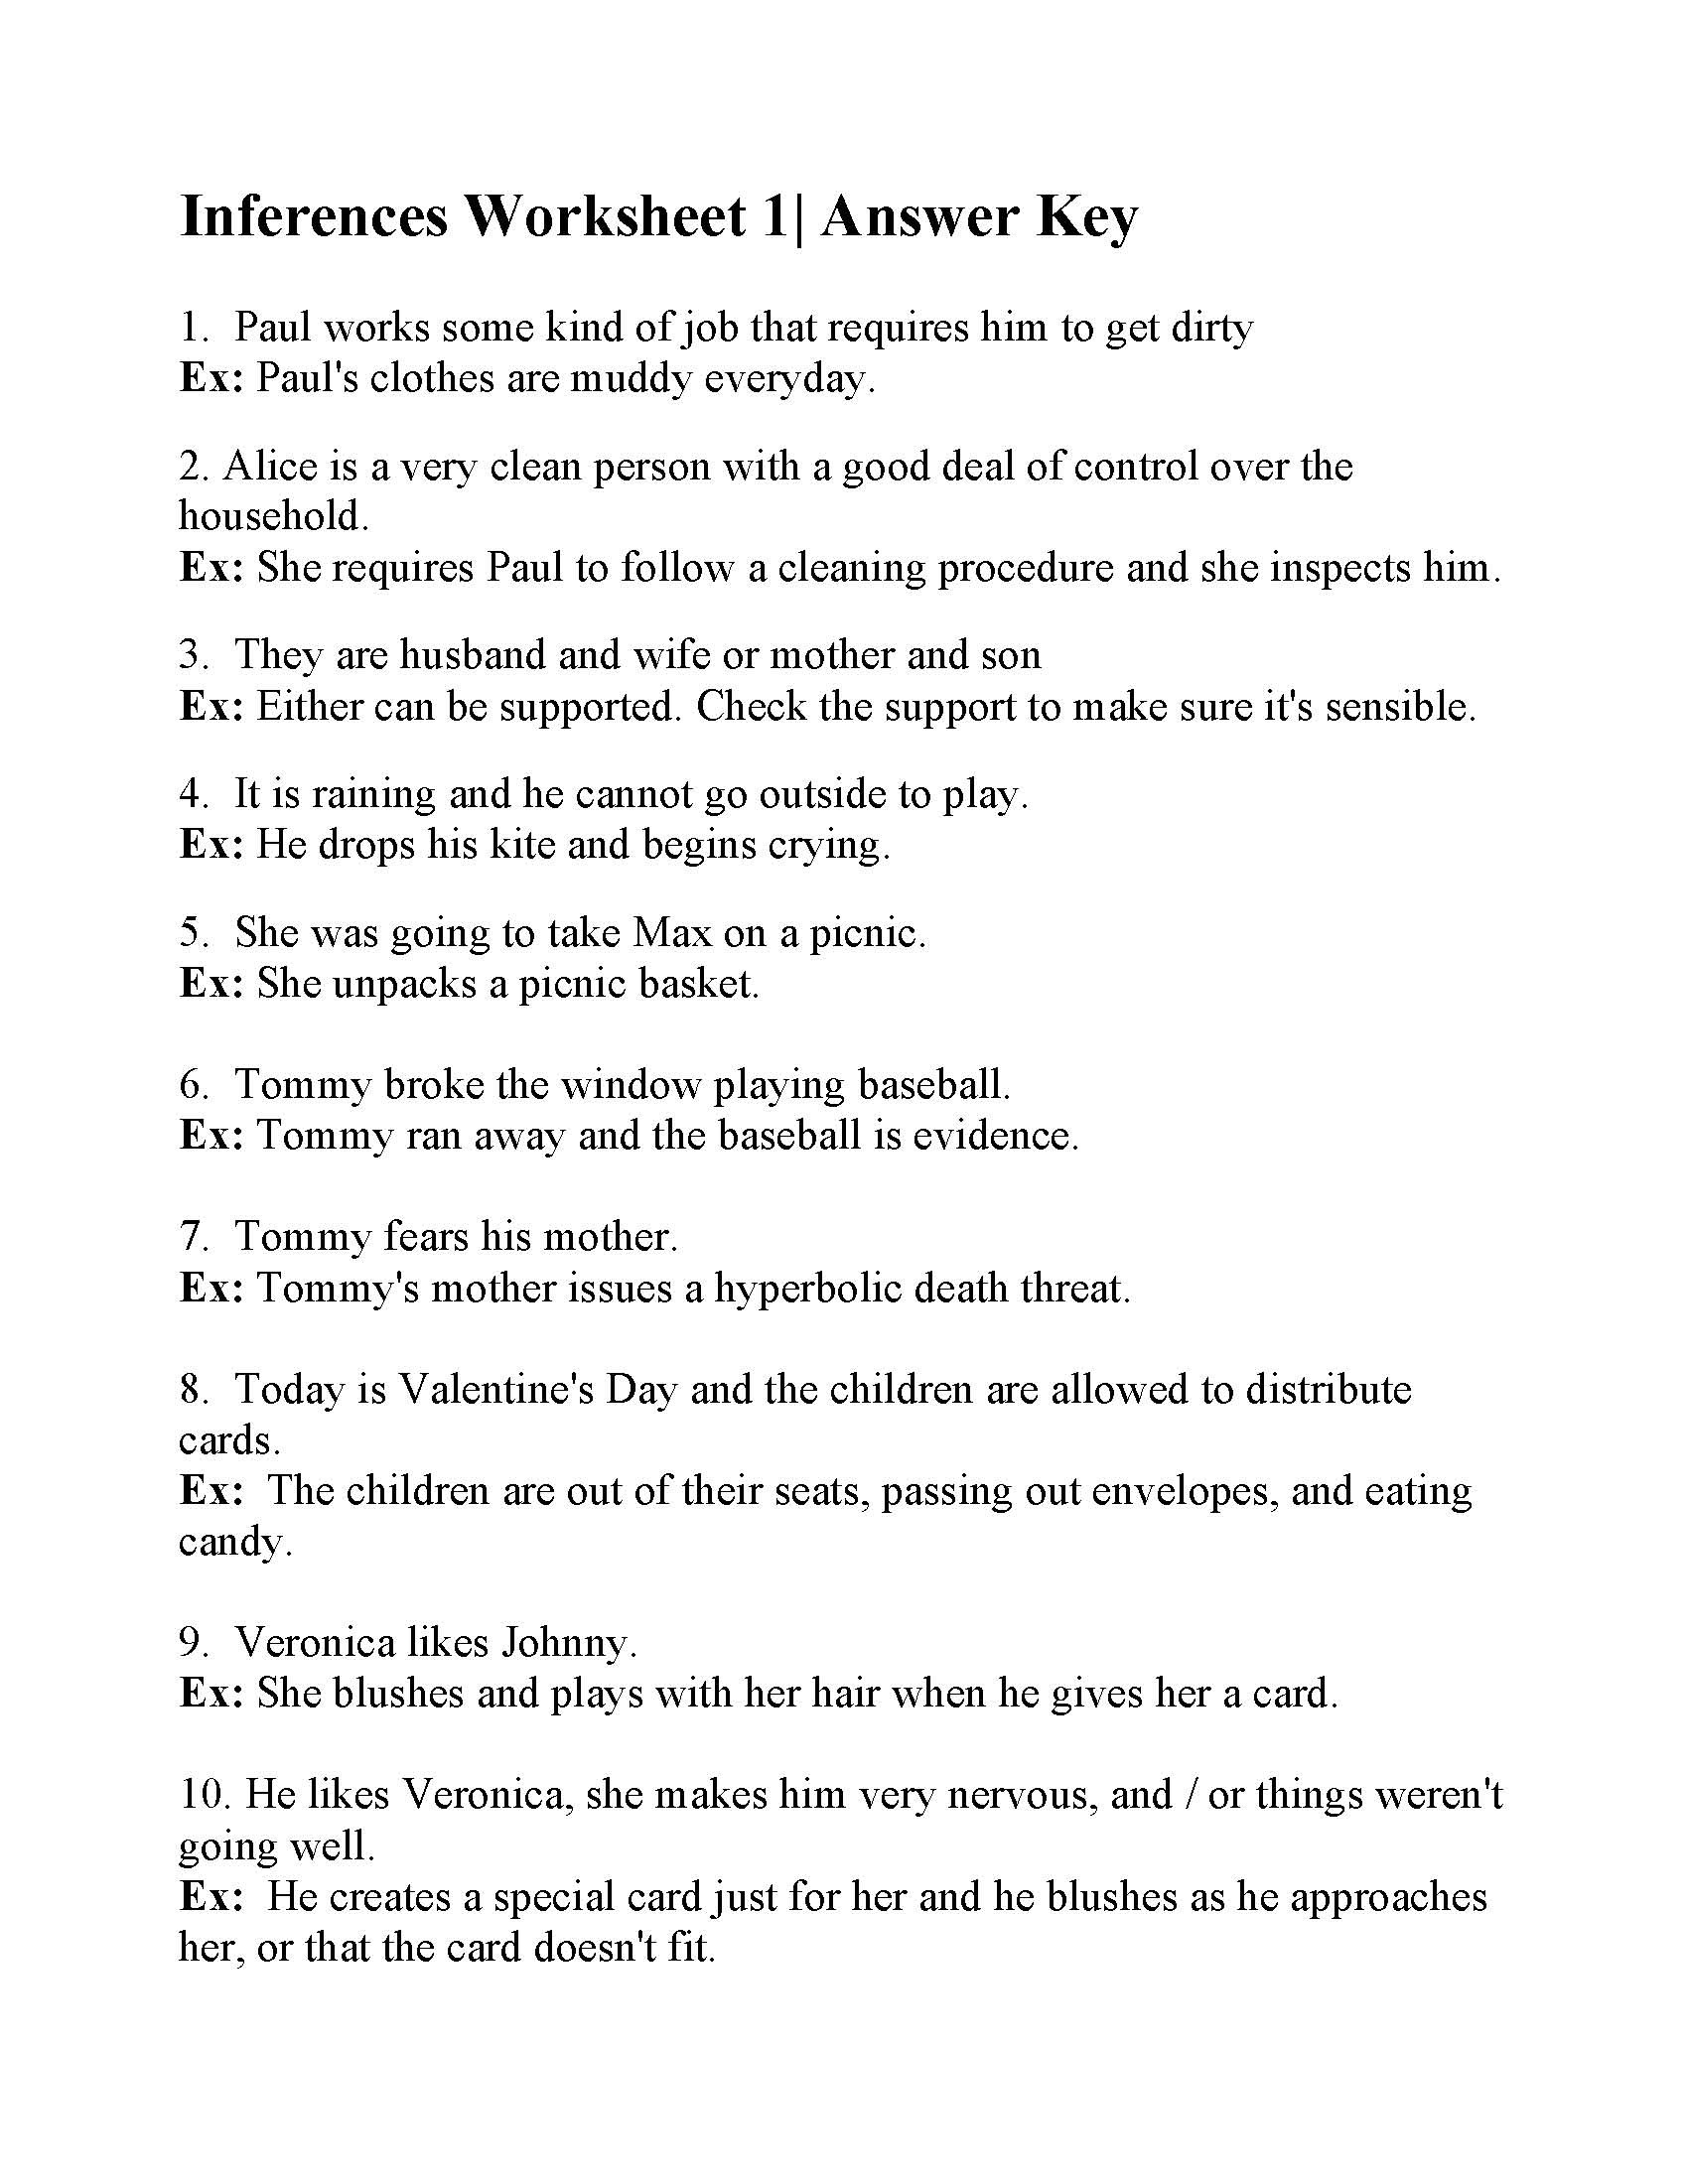 Inference Worksheets for 4th Grade Inferences Worksheet 1